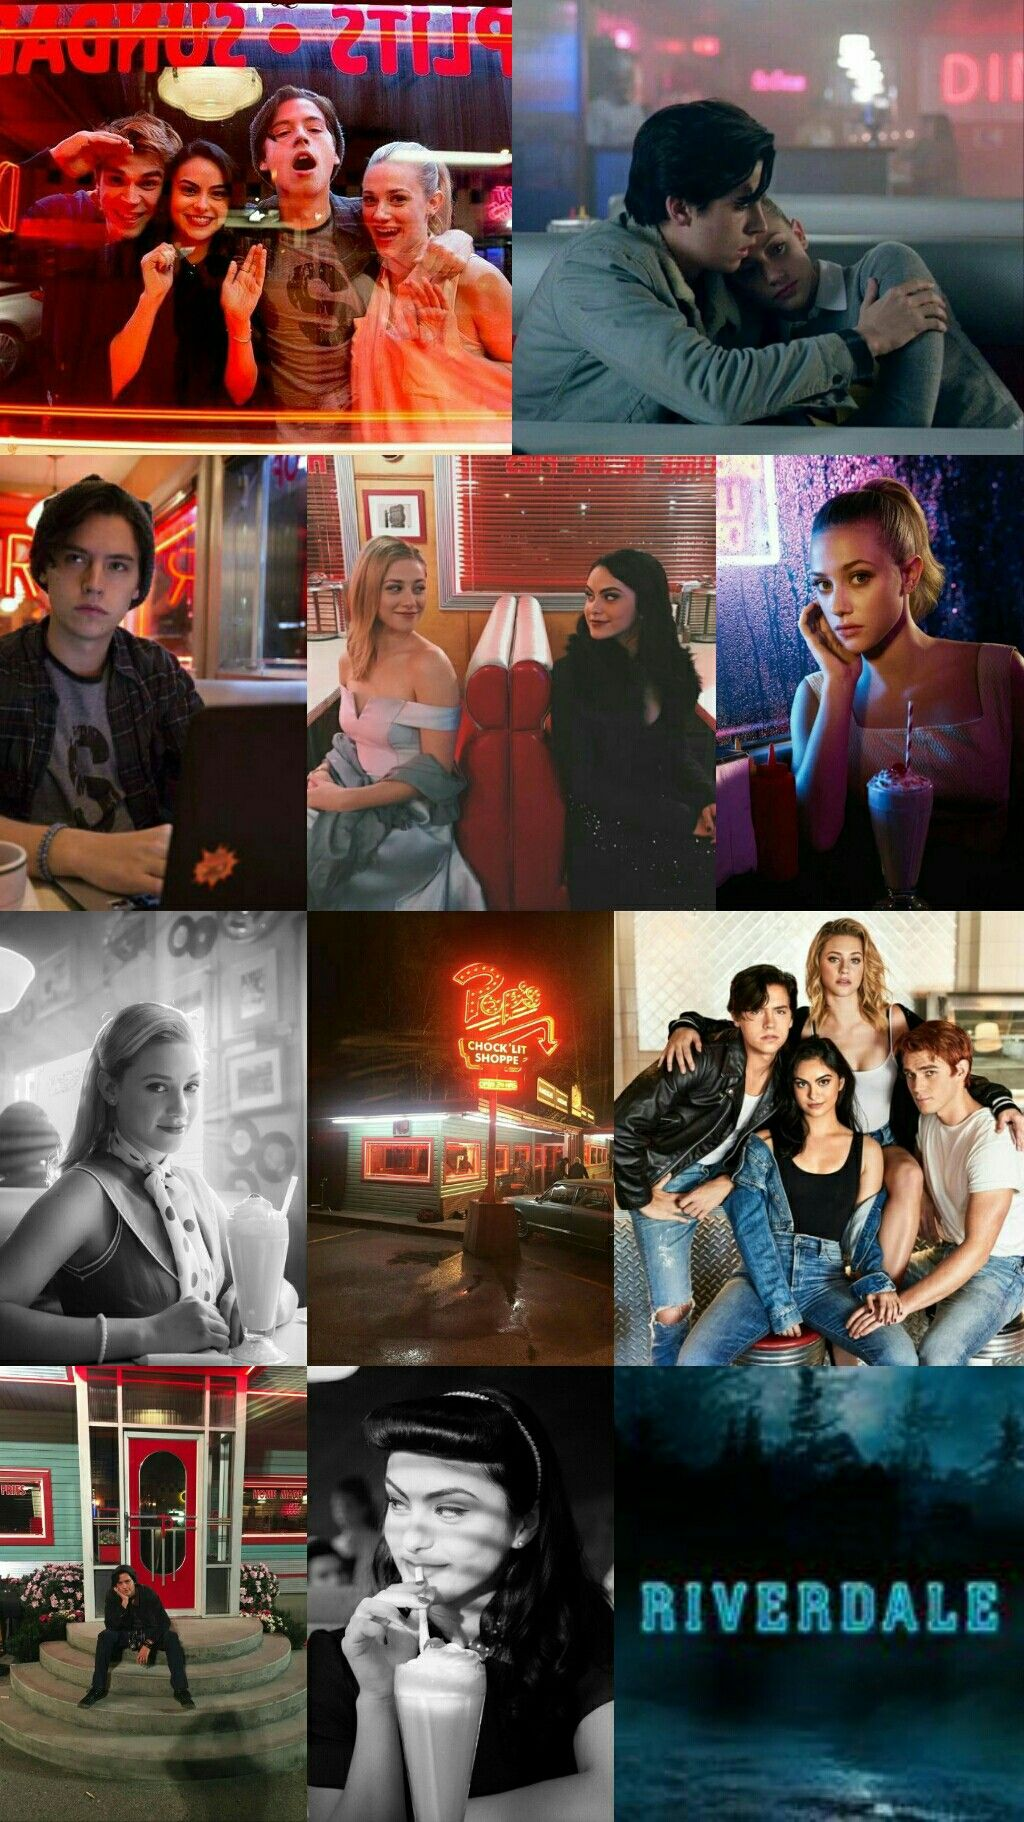 Riverdale | Wallpaper | Betty | jughead | archi | Veronica | | CW TV Shows | Riverdale wallpaper ...